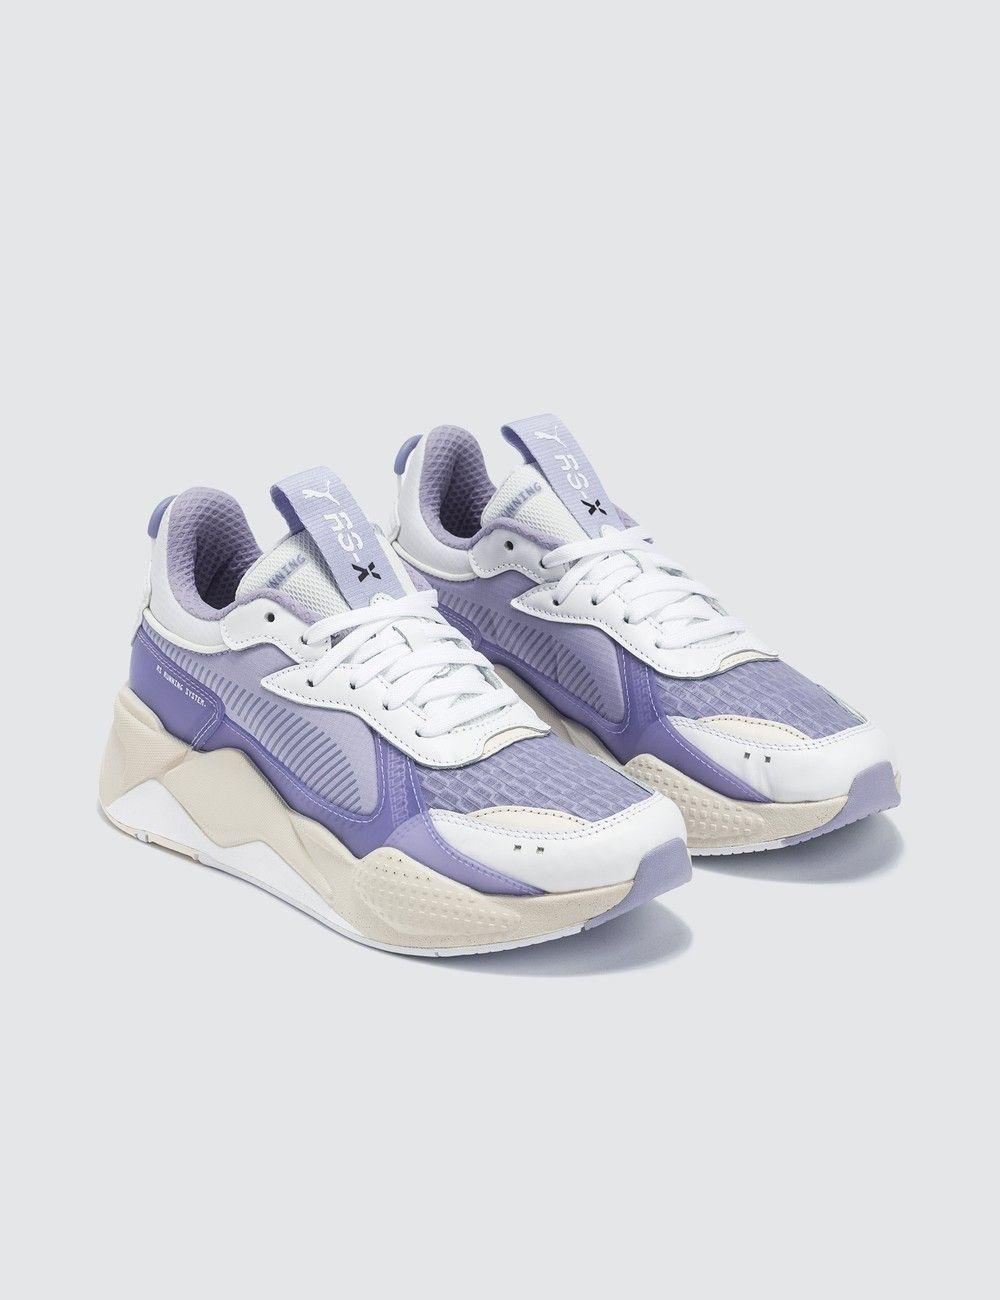 RS-X Tech | Puma, Top sneakers, Sneakers